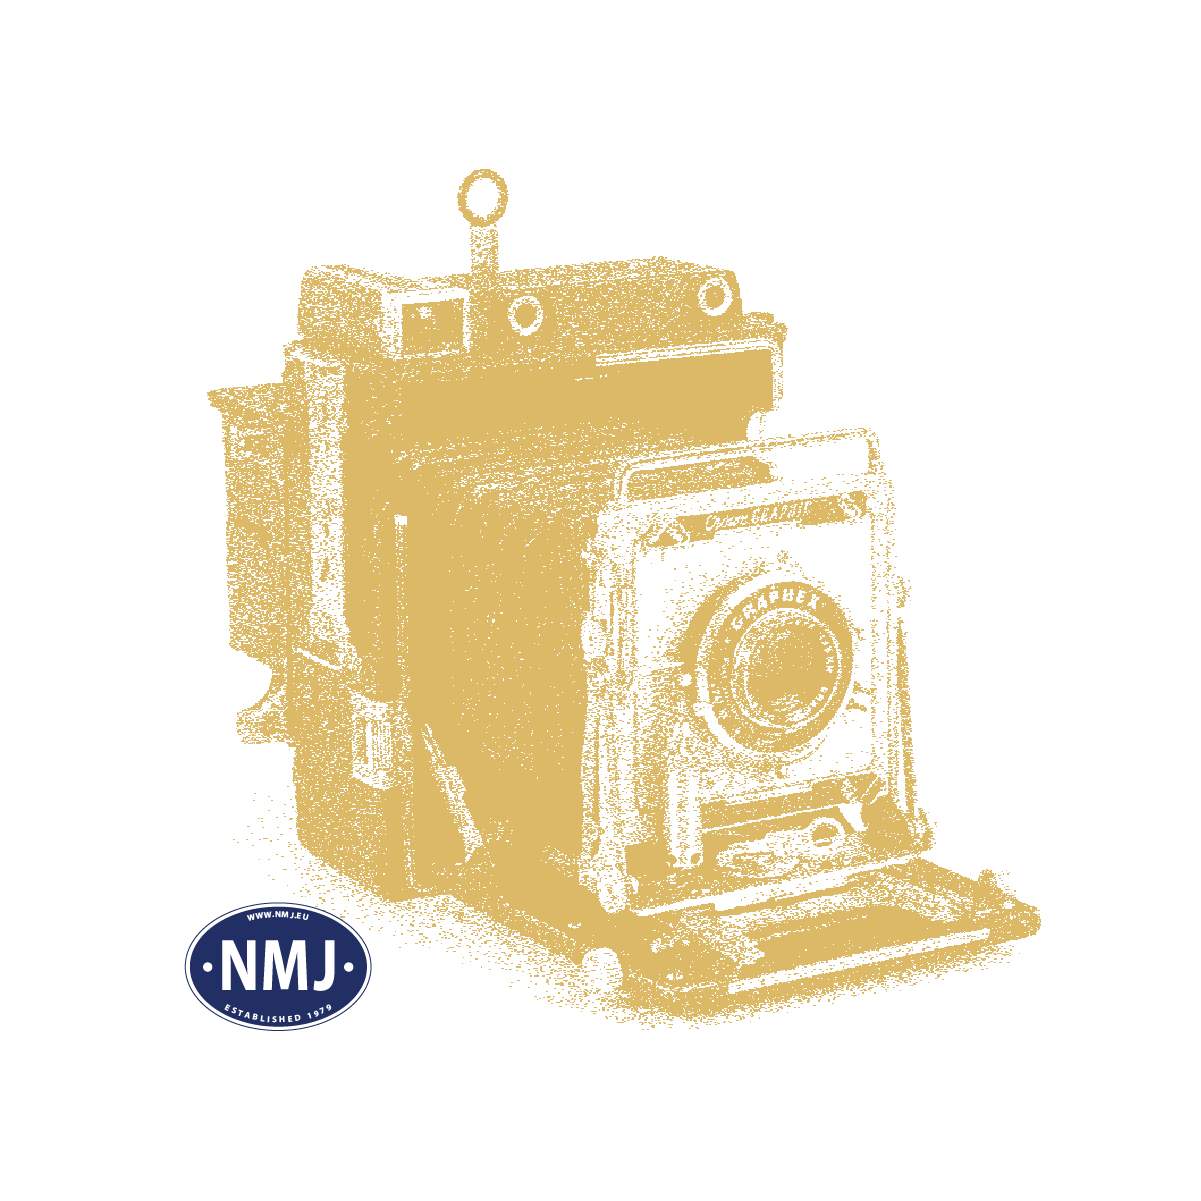 NMJT145001 - NMJ Topline NSB Di3.602 Grün, Spur 0